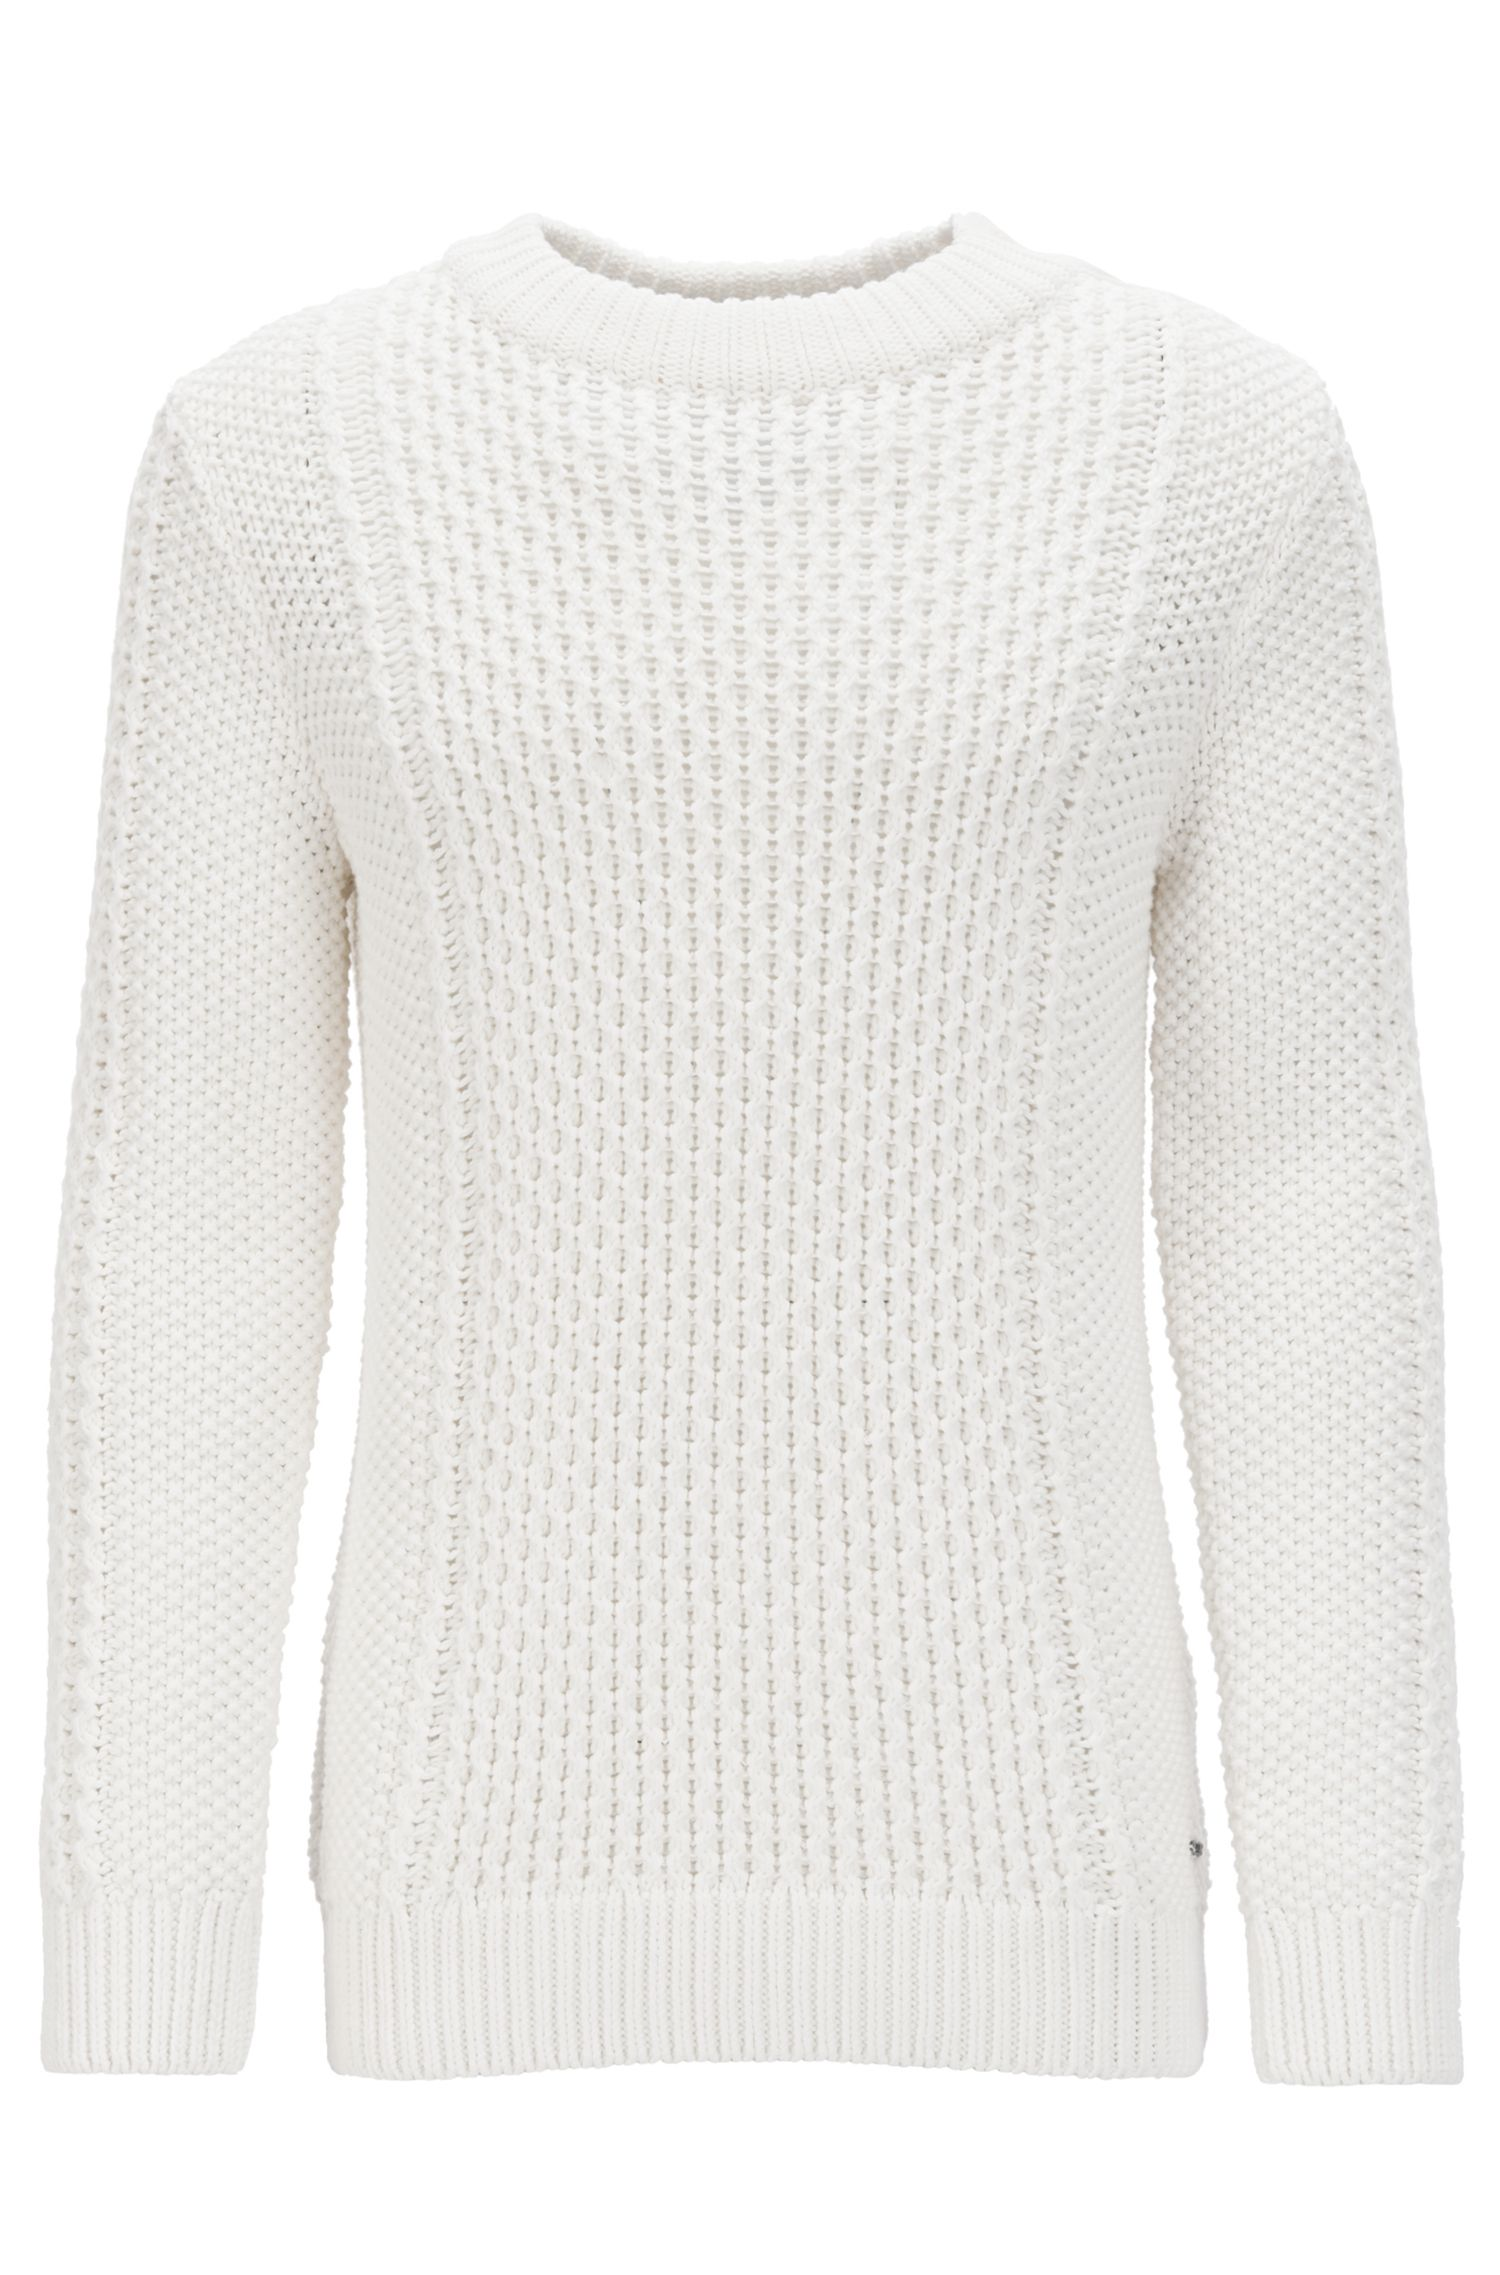 Cotton Blend Chunky Sweater | Delmonte, White